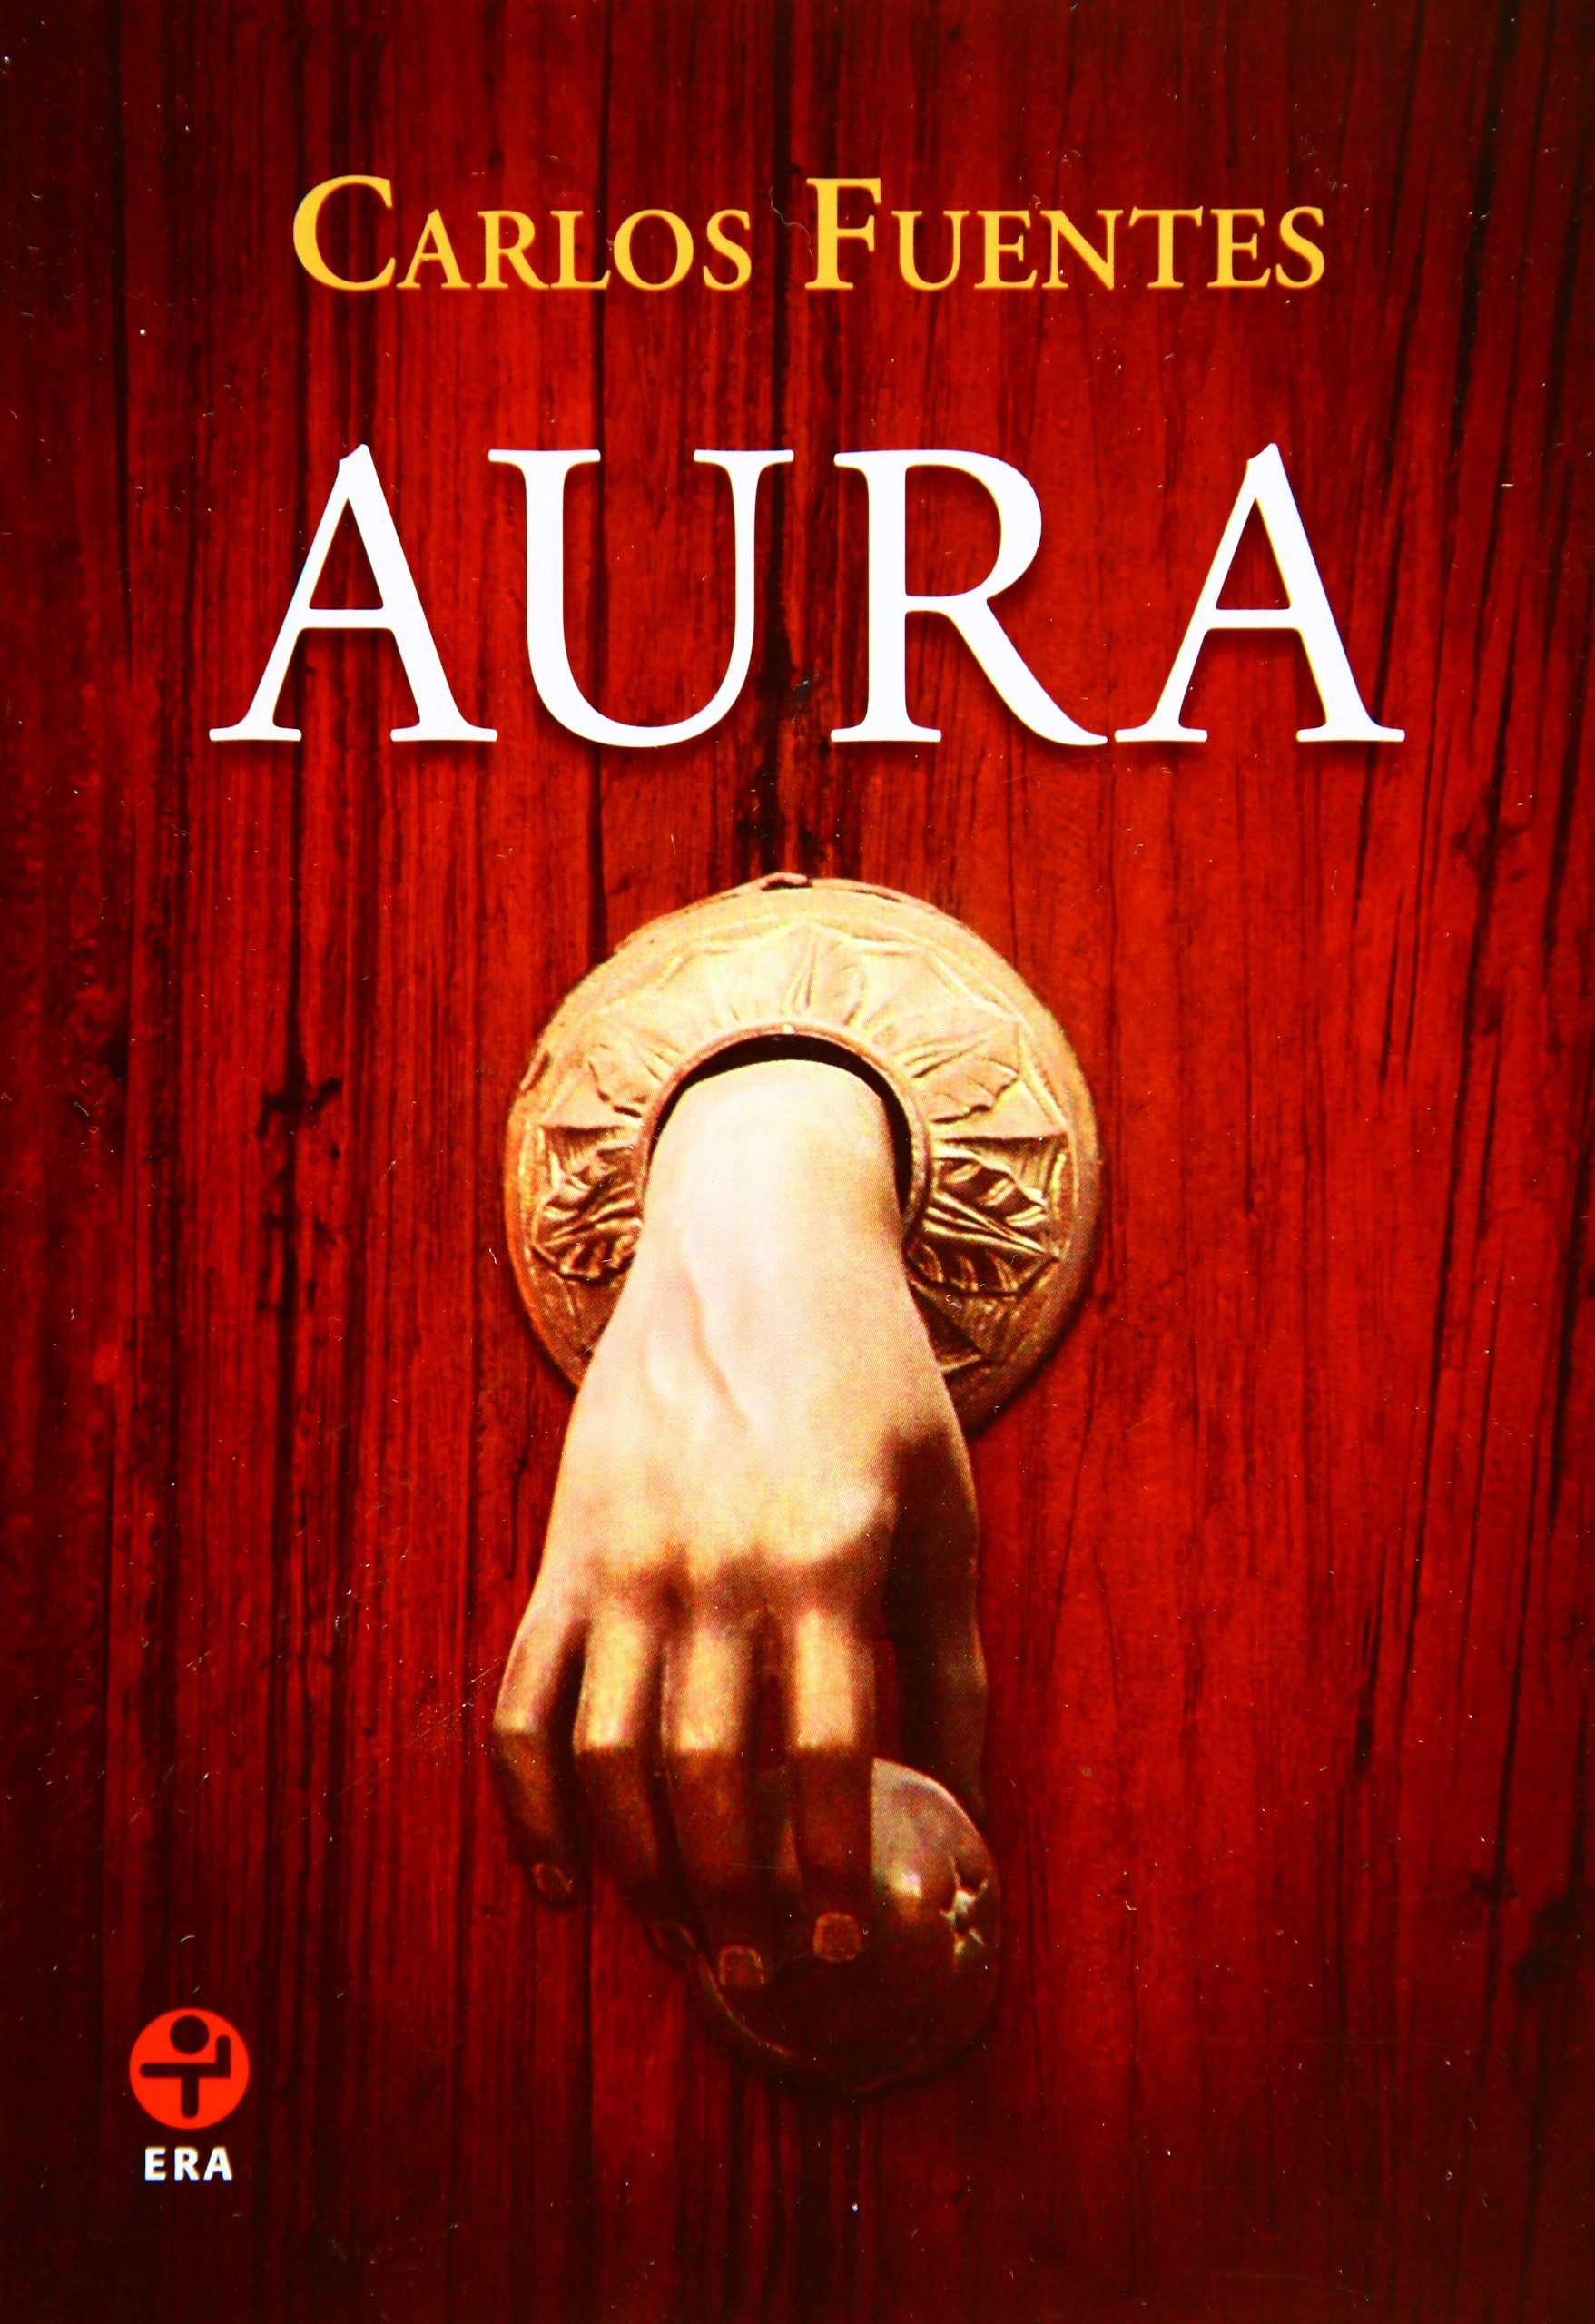 Aura spanish edition carlos fuentes 9786074451849 amazon books fandeluxe Gallery